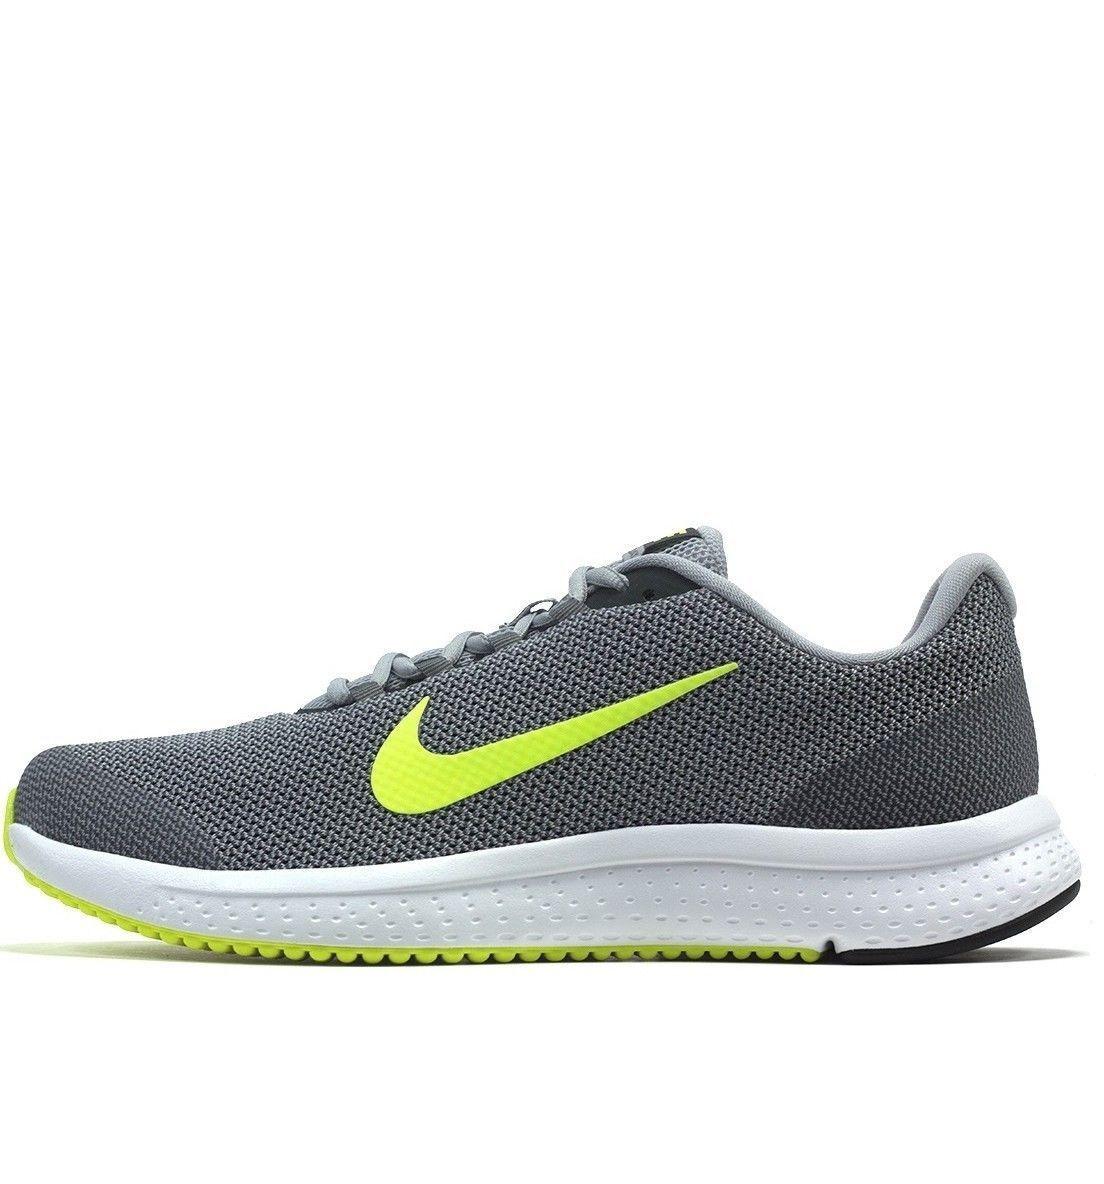 New Nike Runallday Men's Running Training Shoes Grey Volt Anthracite 898464 012